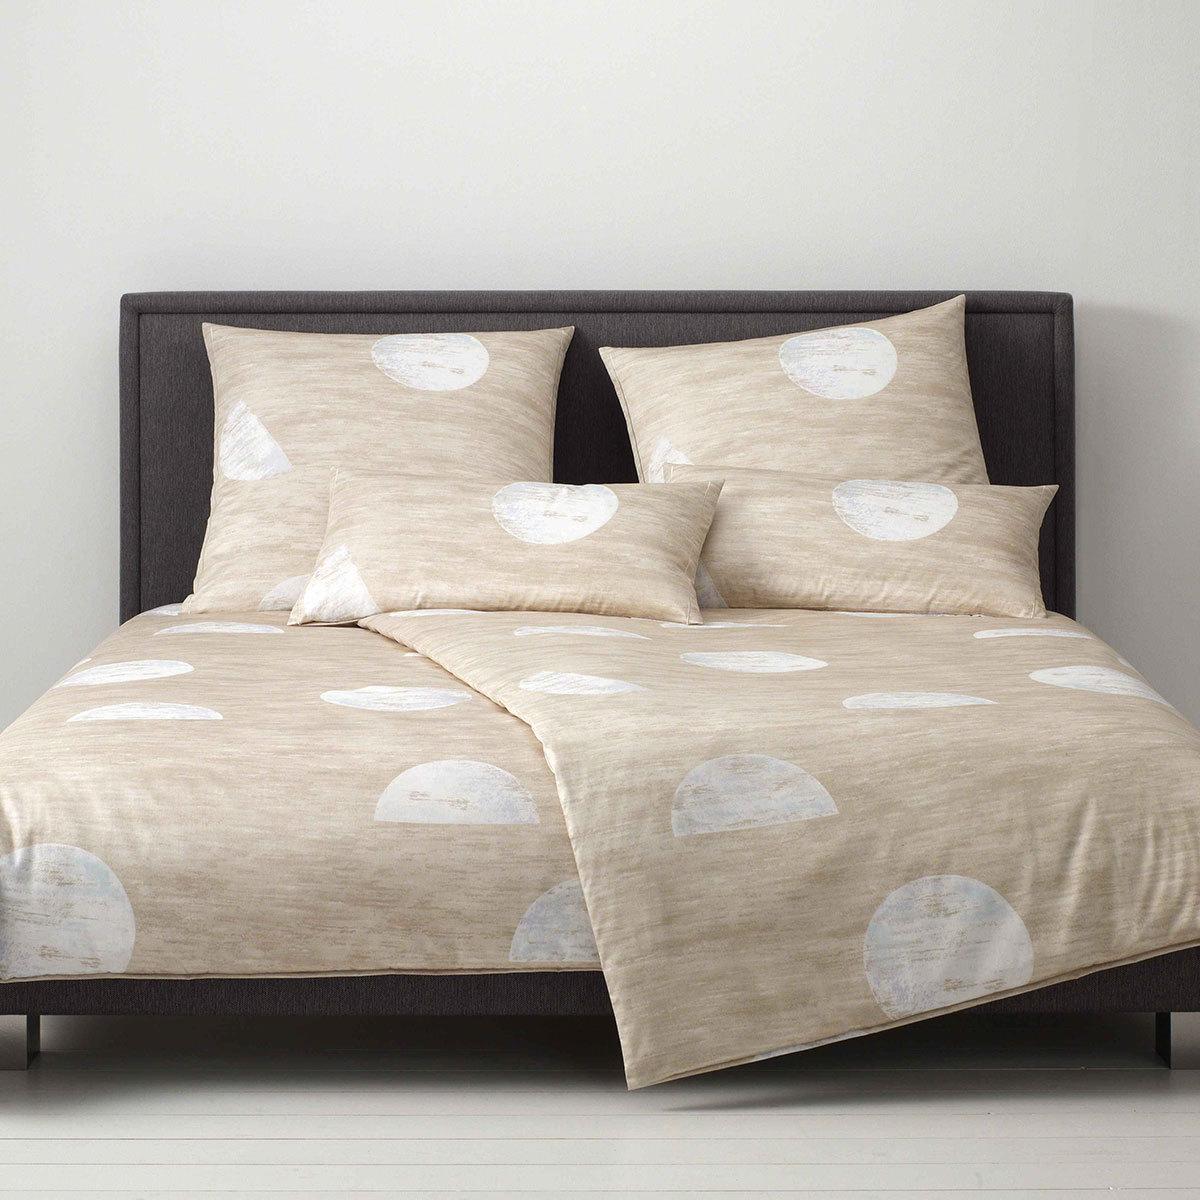 Bettwaren-Shop Mako-Satin Bettwäsche Mond